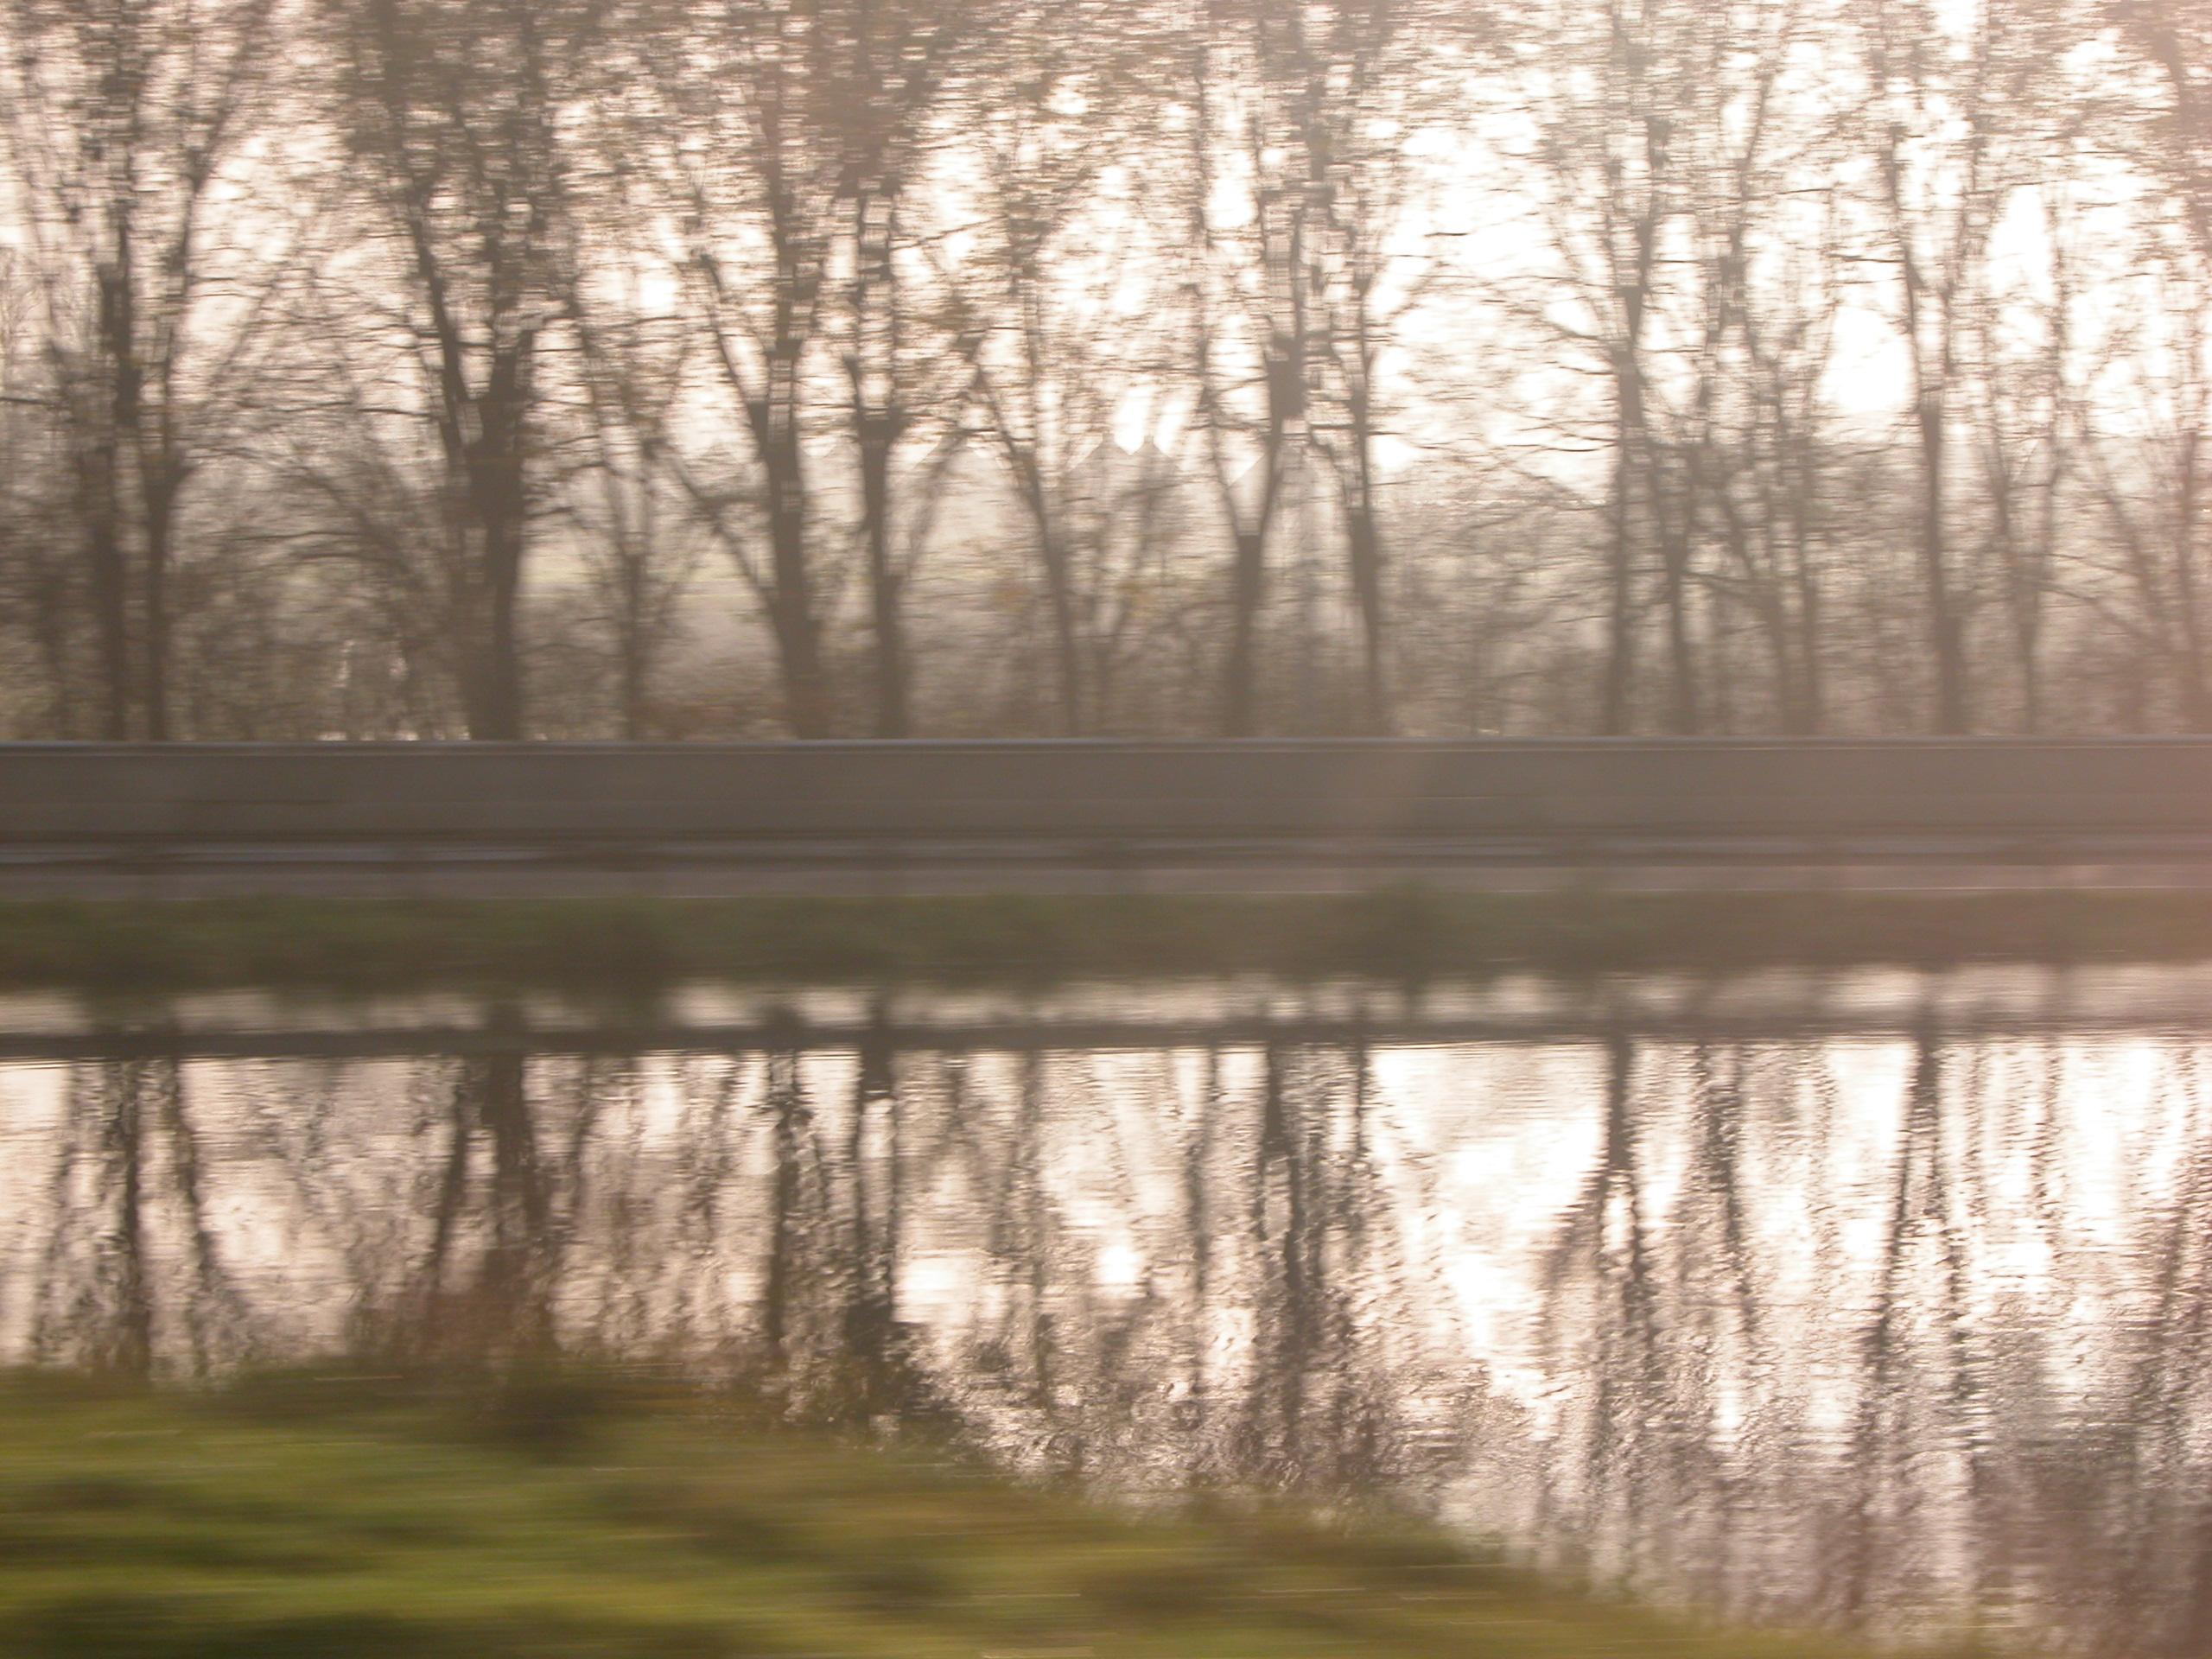 blurs trees water mirroring speed speeding nature landscapes